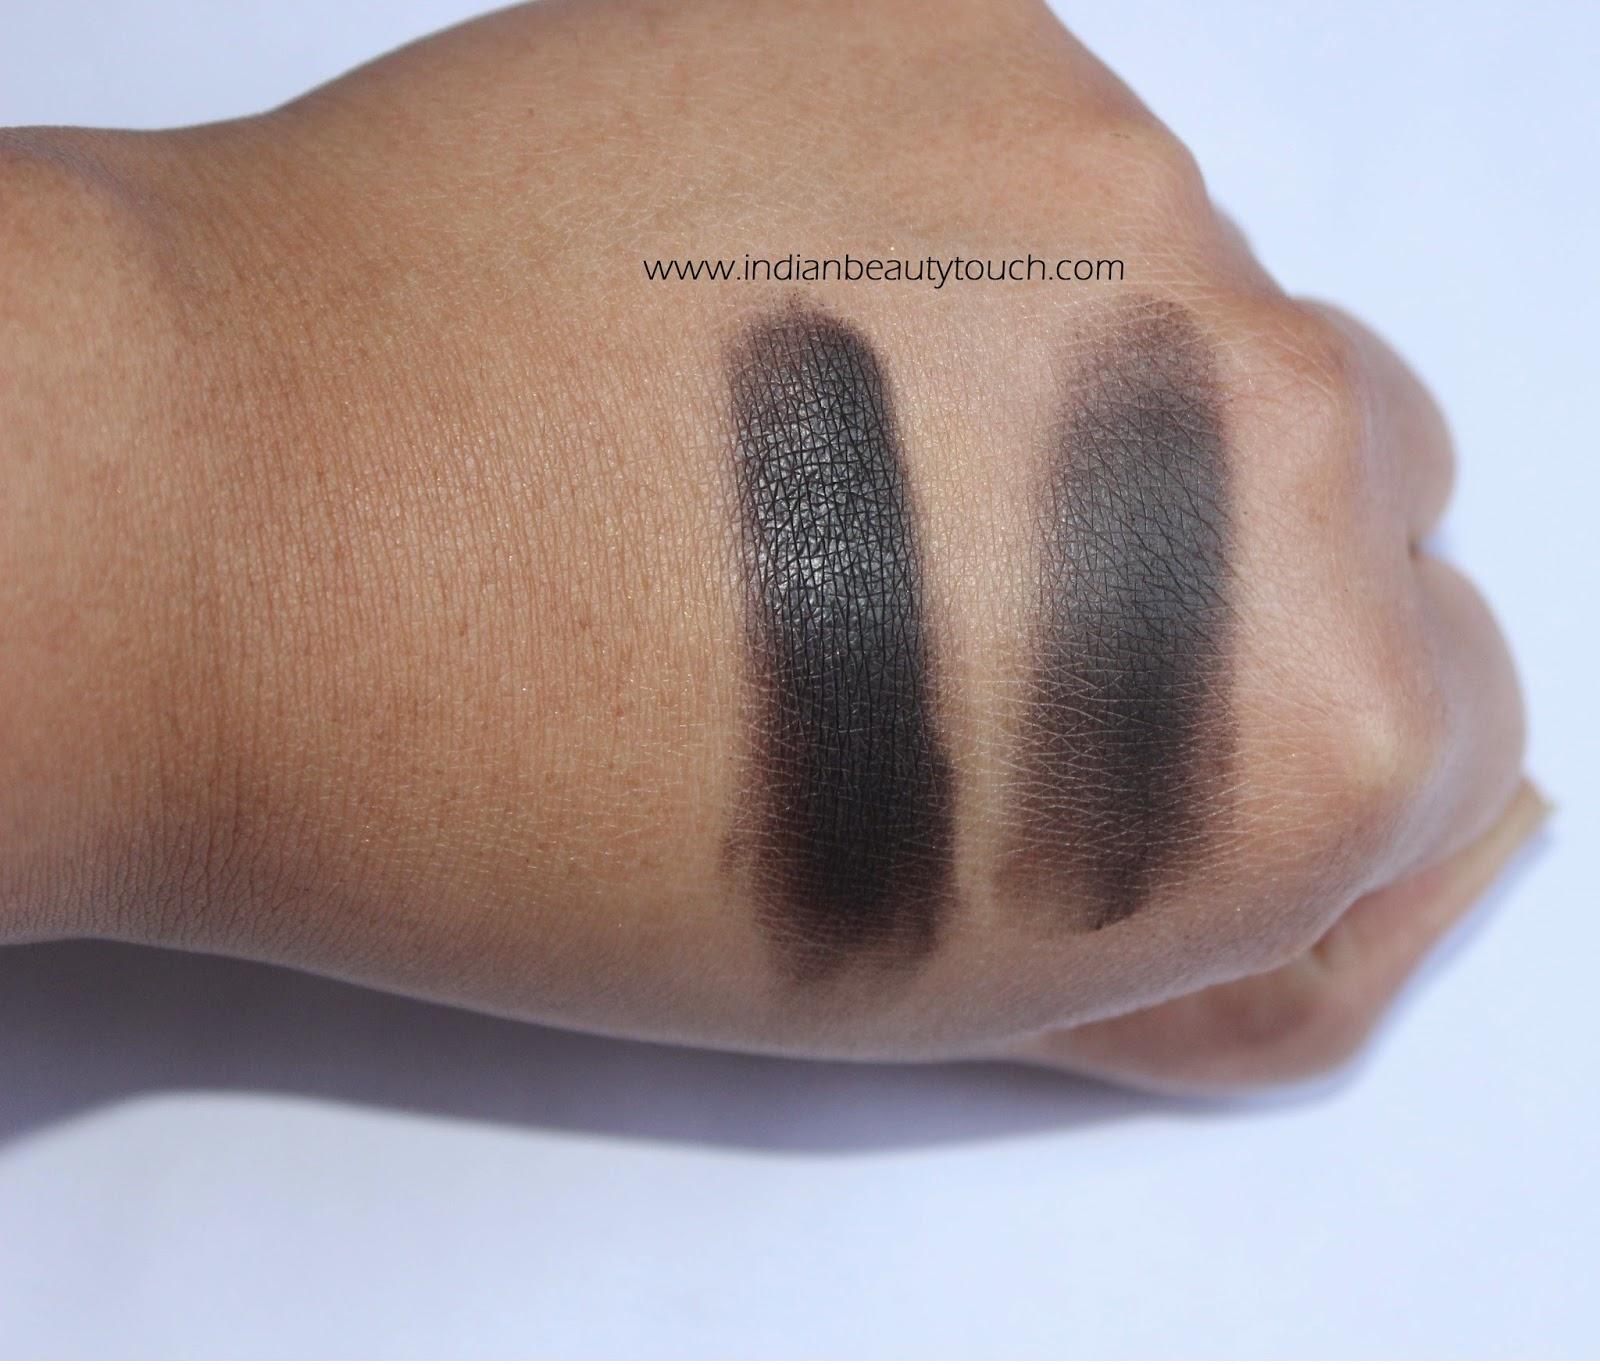 Eyeshadow Primer by Milani #5